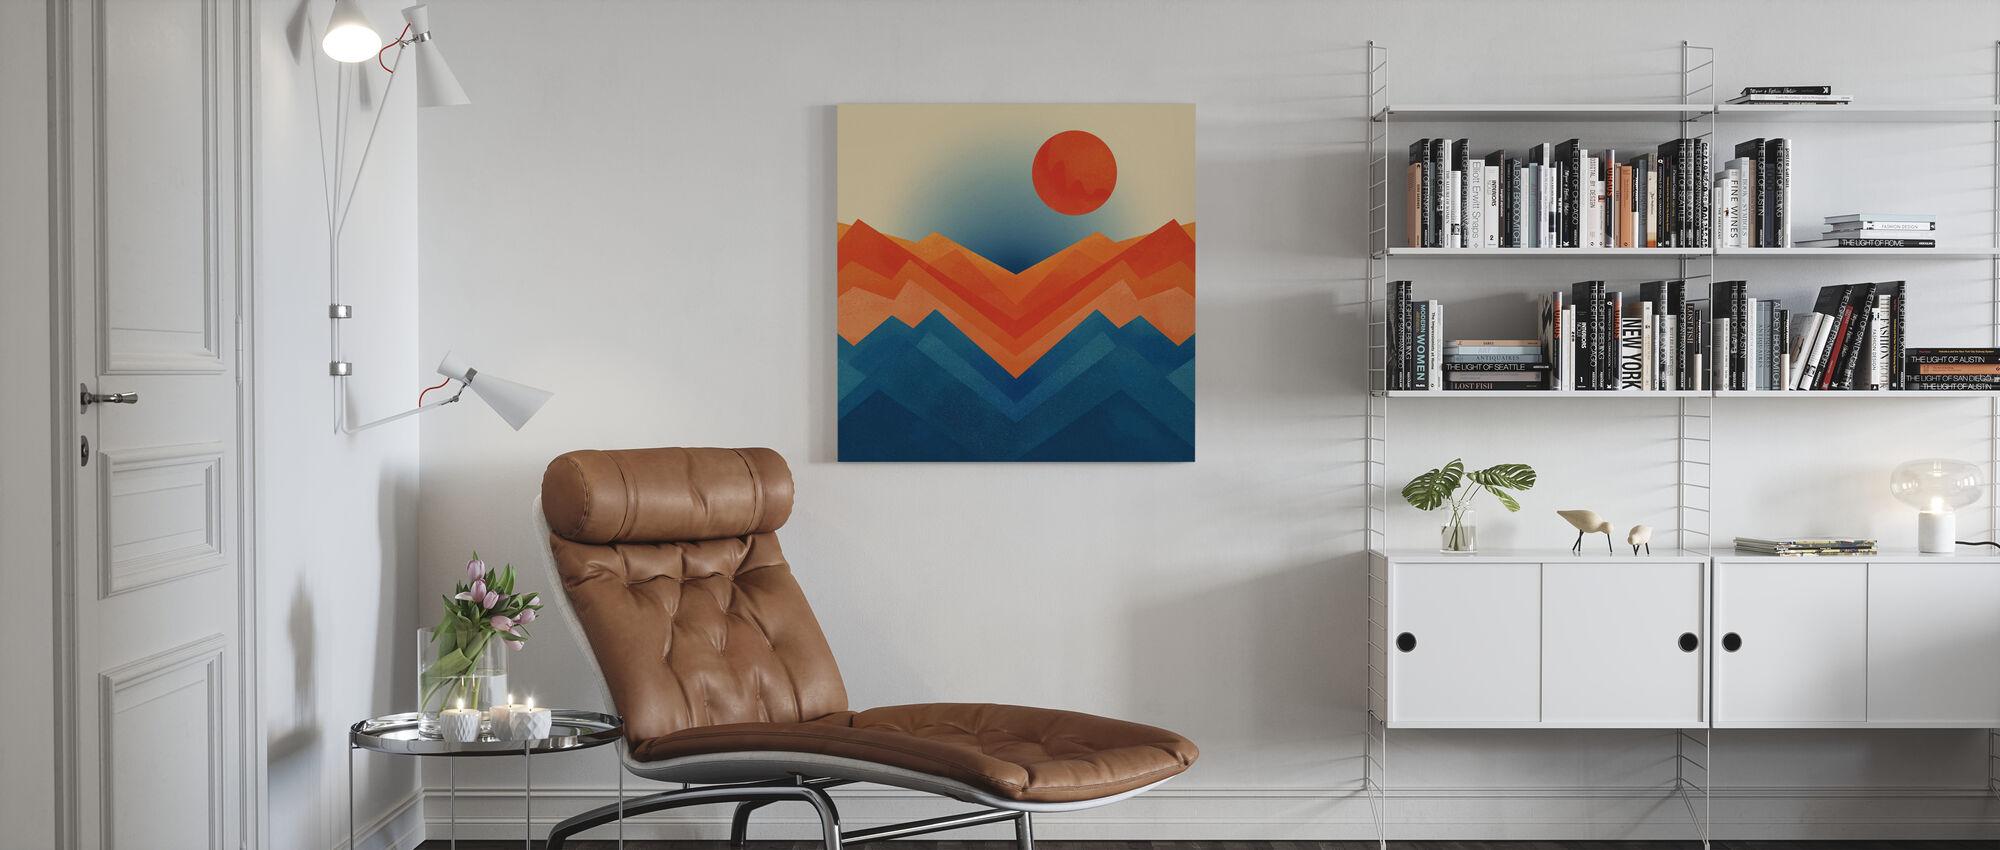 Happy Mountain nr 2 - Canvas print - Living Room